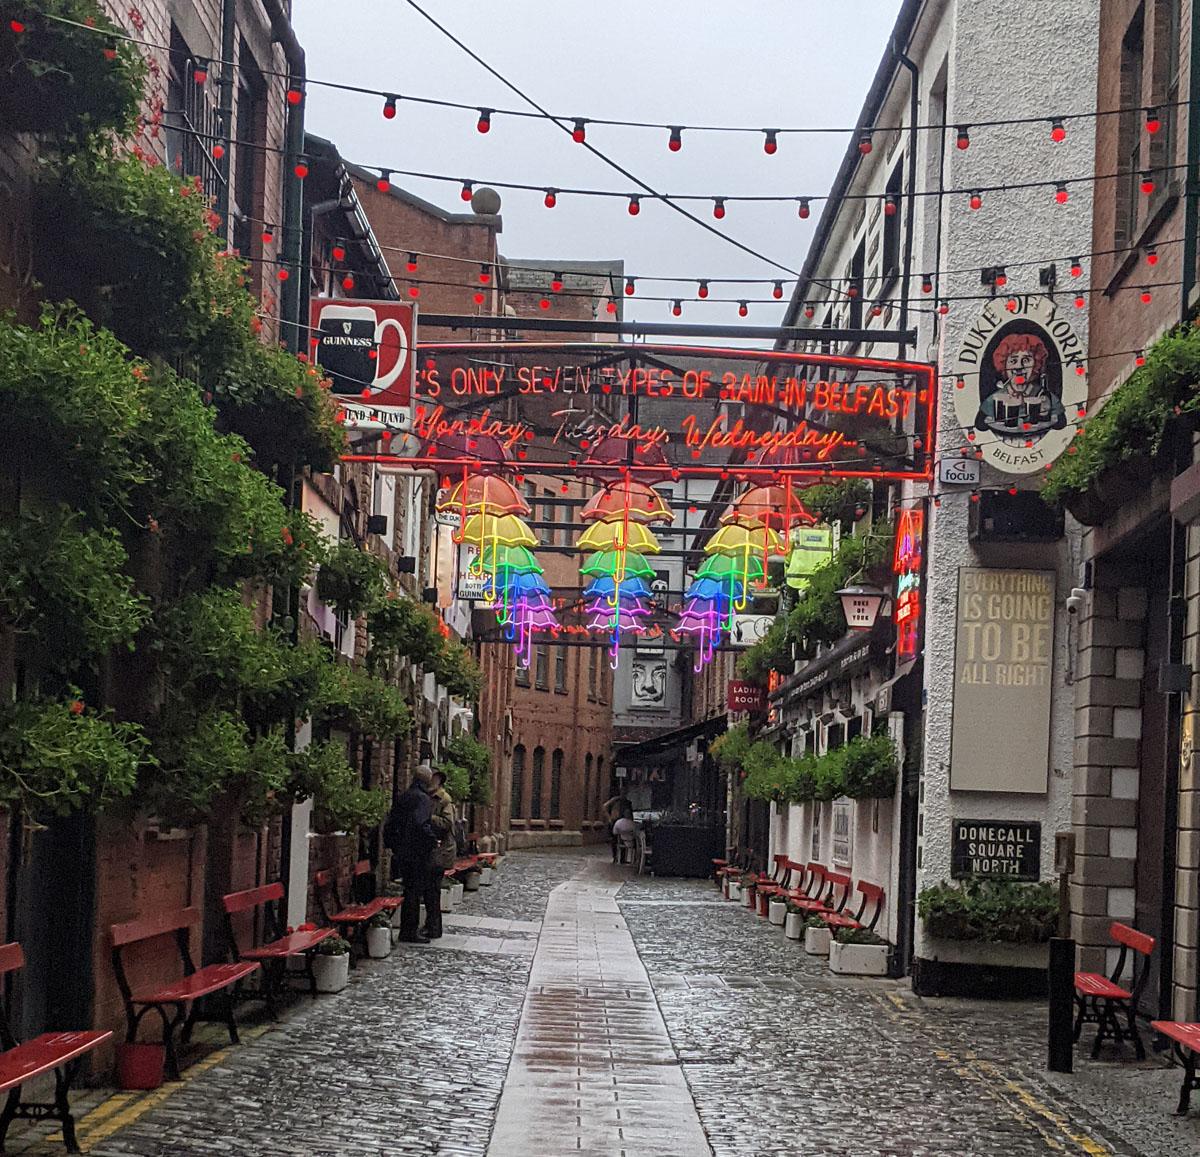 Belfast Umbrellas in the Rain